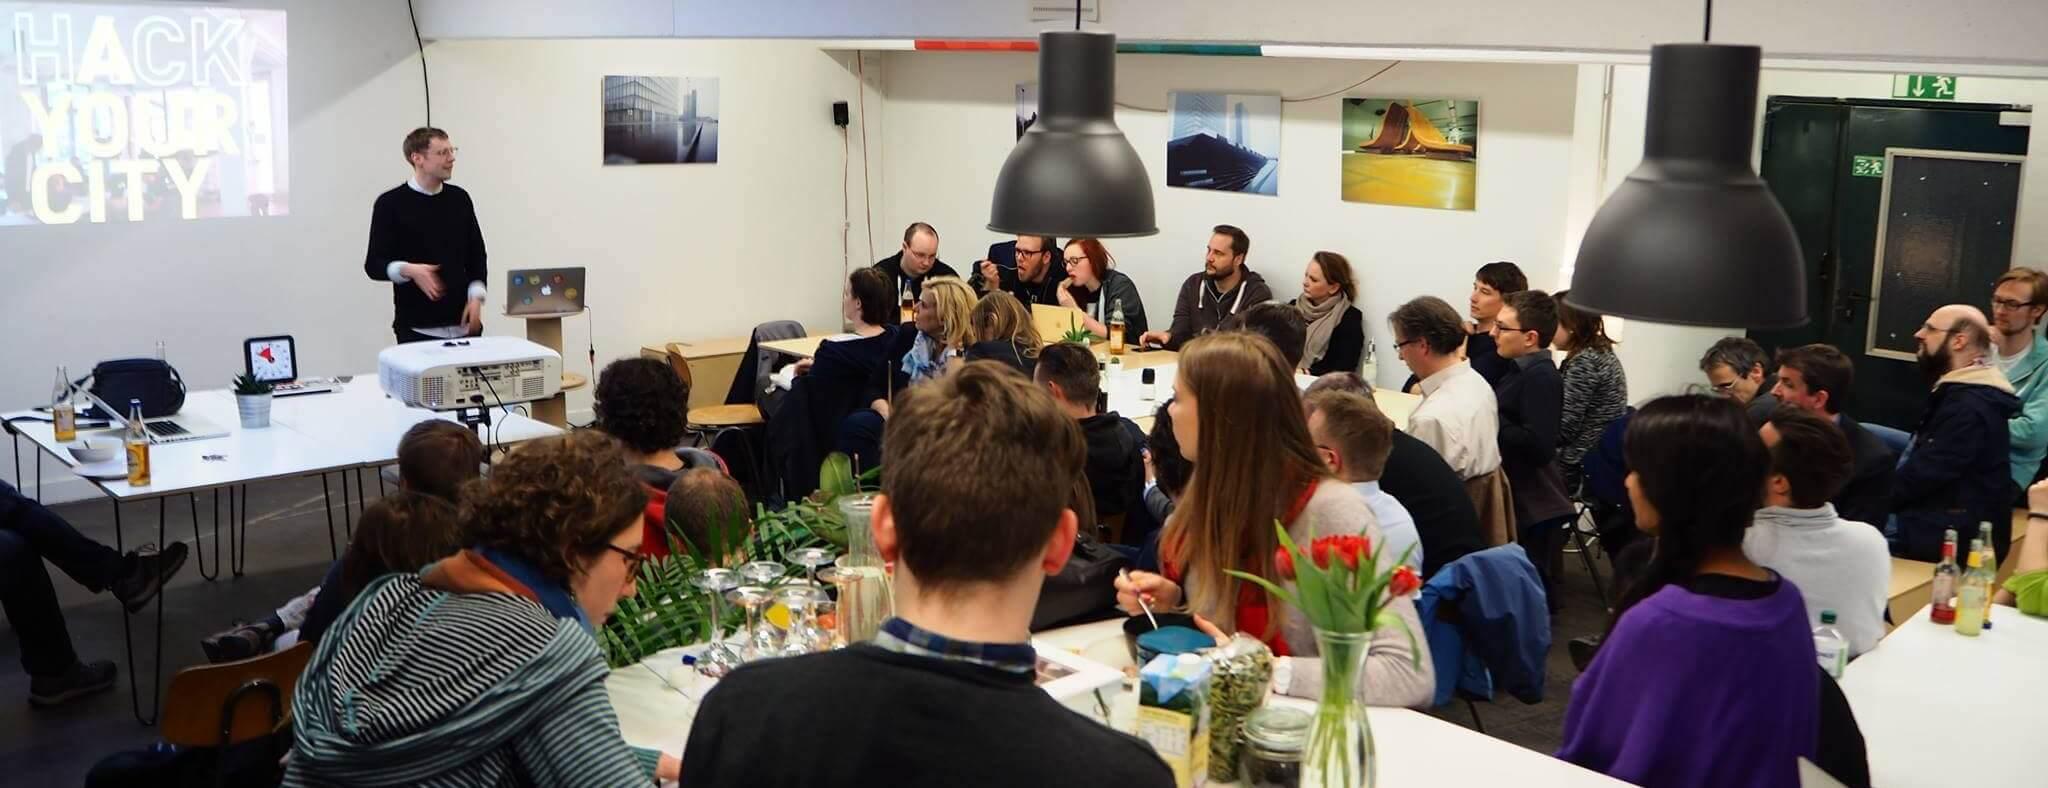 Gründerszene: In Kiel tut sich jede Menge!